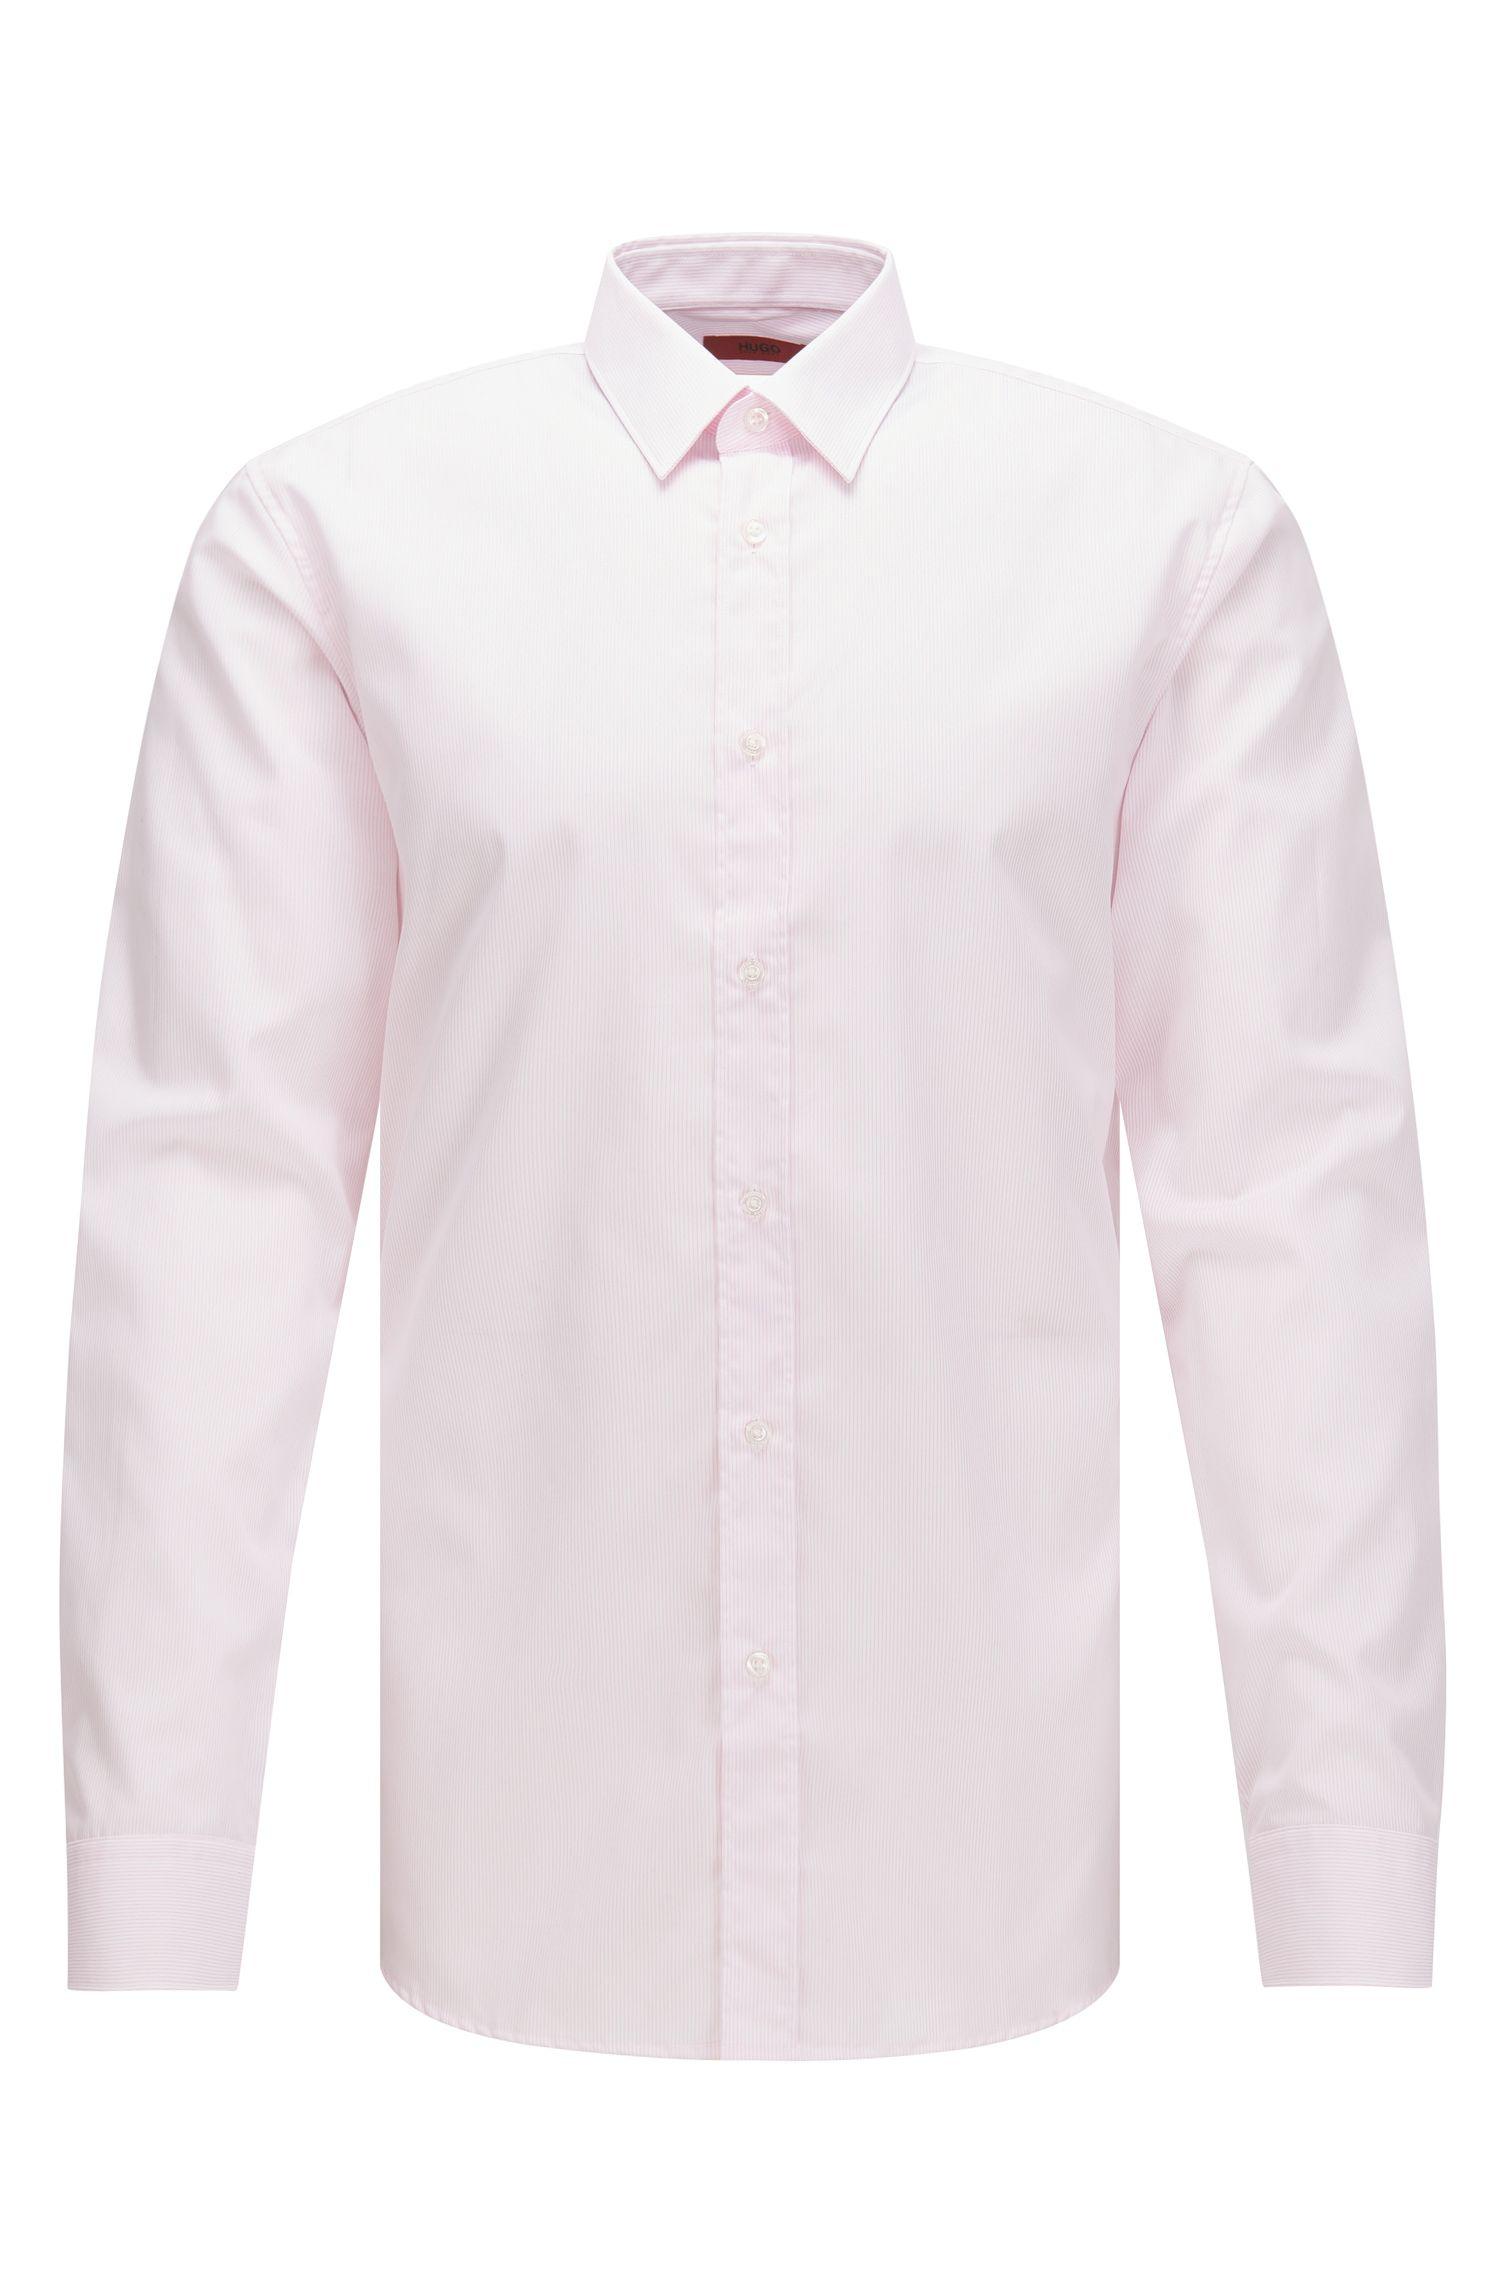 Striped Easy Iron Cotton Dress Shirt, Slim Fit | Elisha